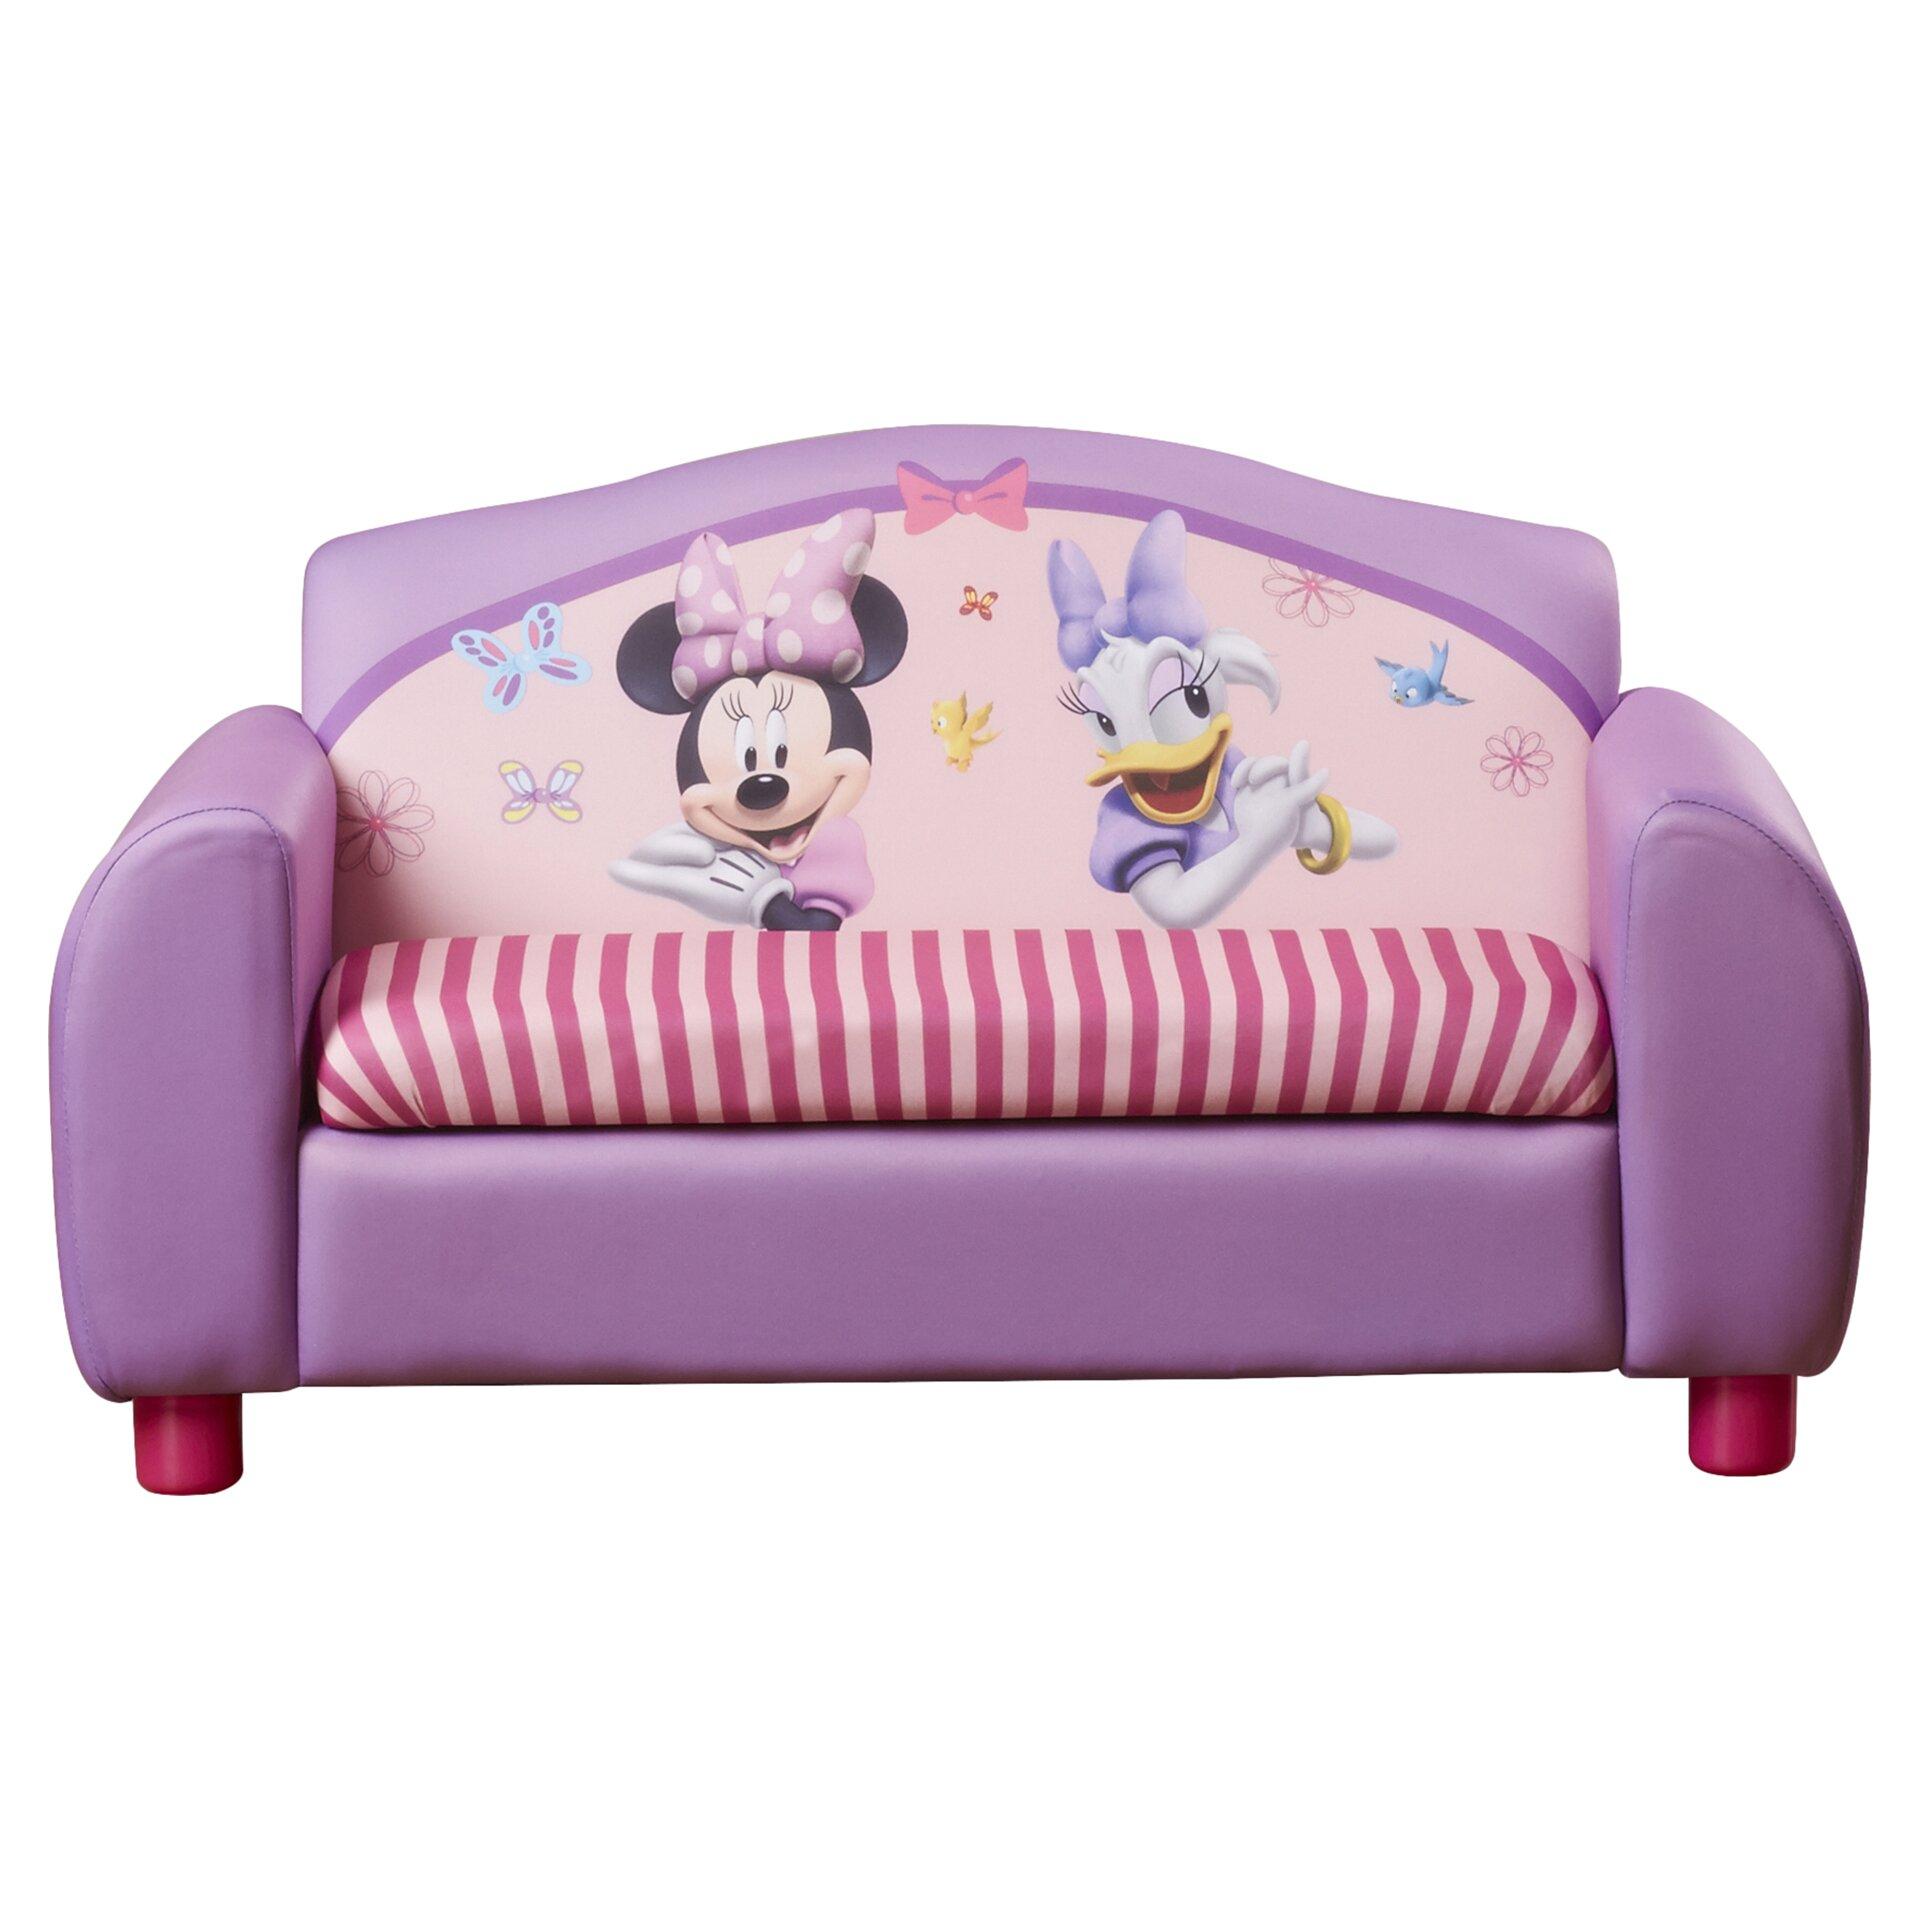 Delta Children Disney Minnie Mouse Kids Sofa With Storage Compartment Reviews Wayfair Supply